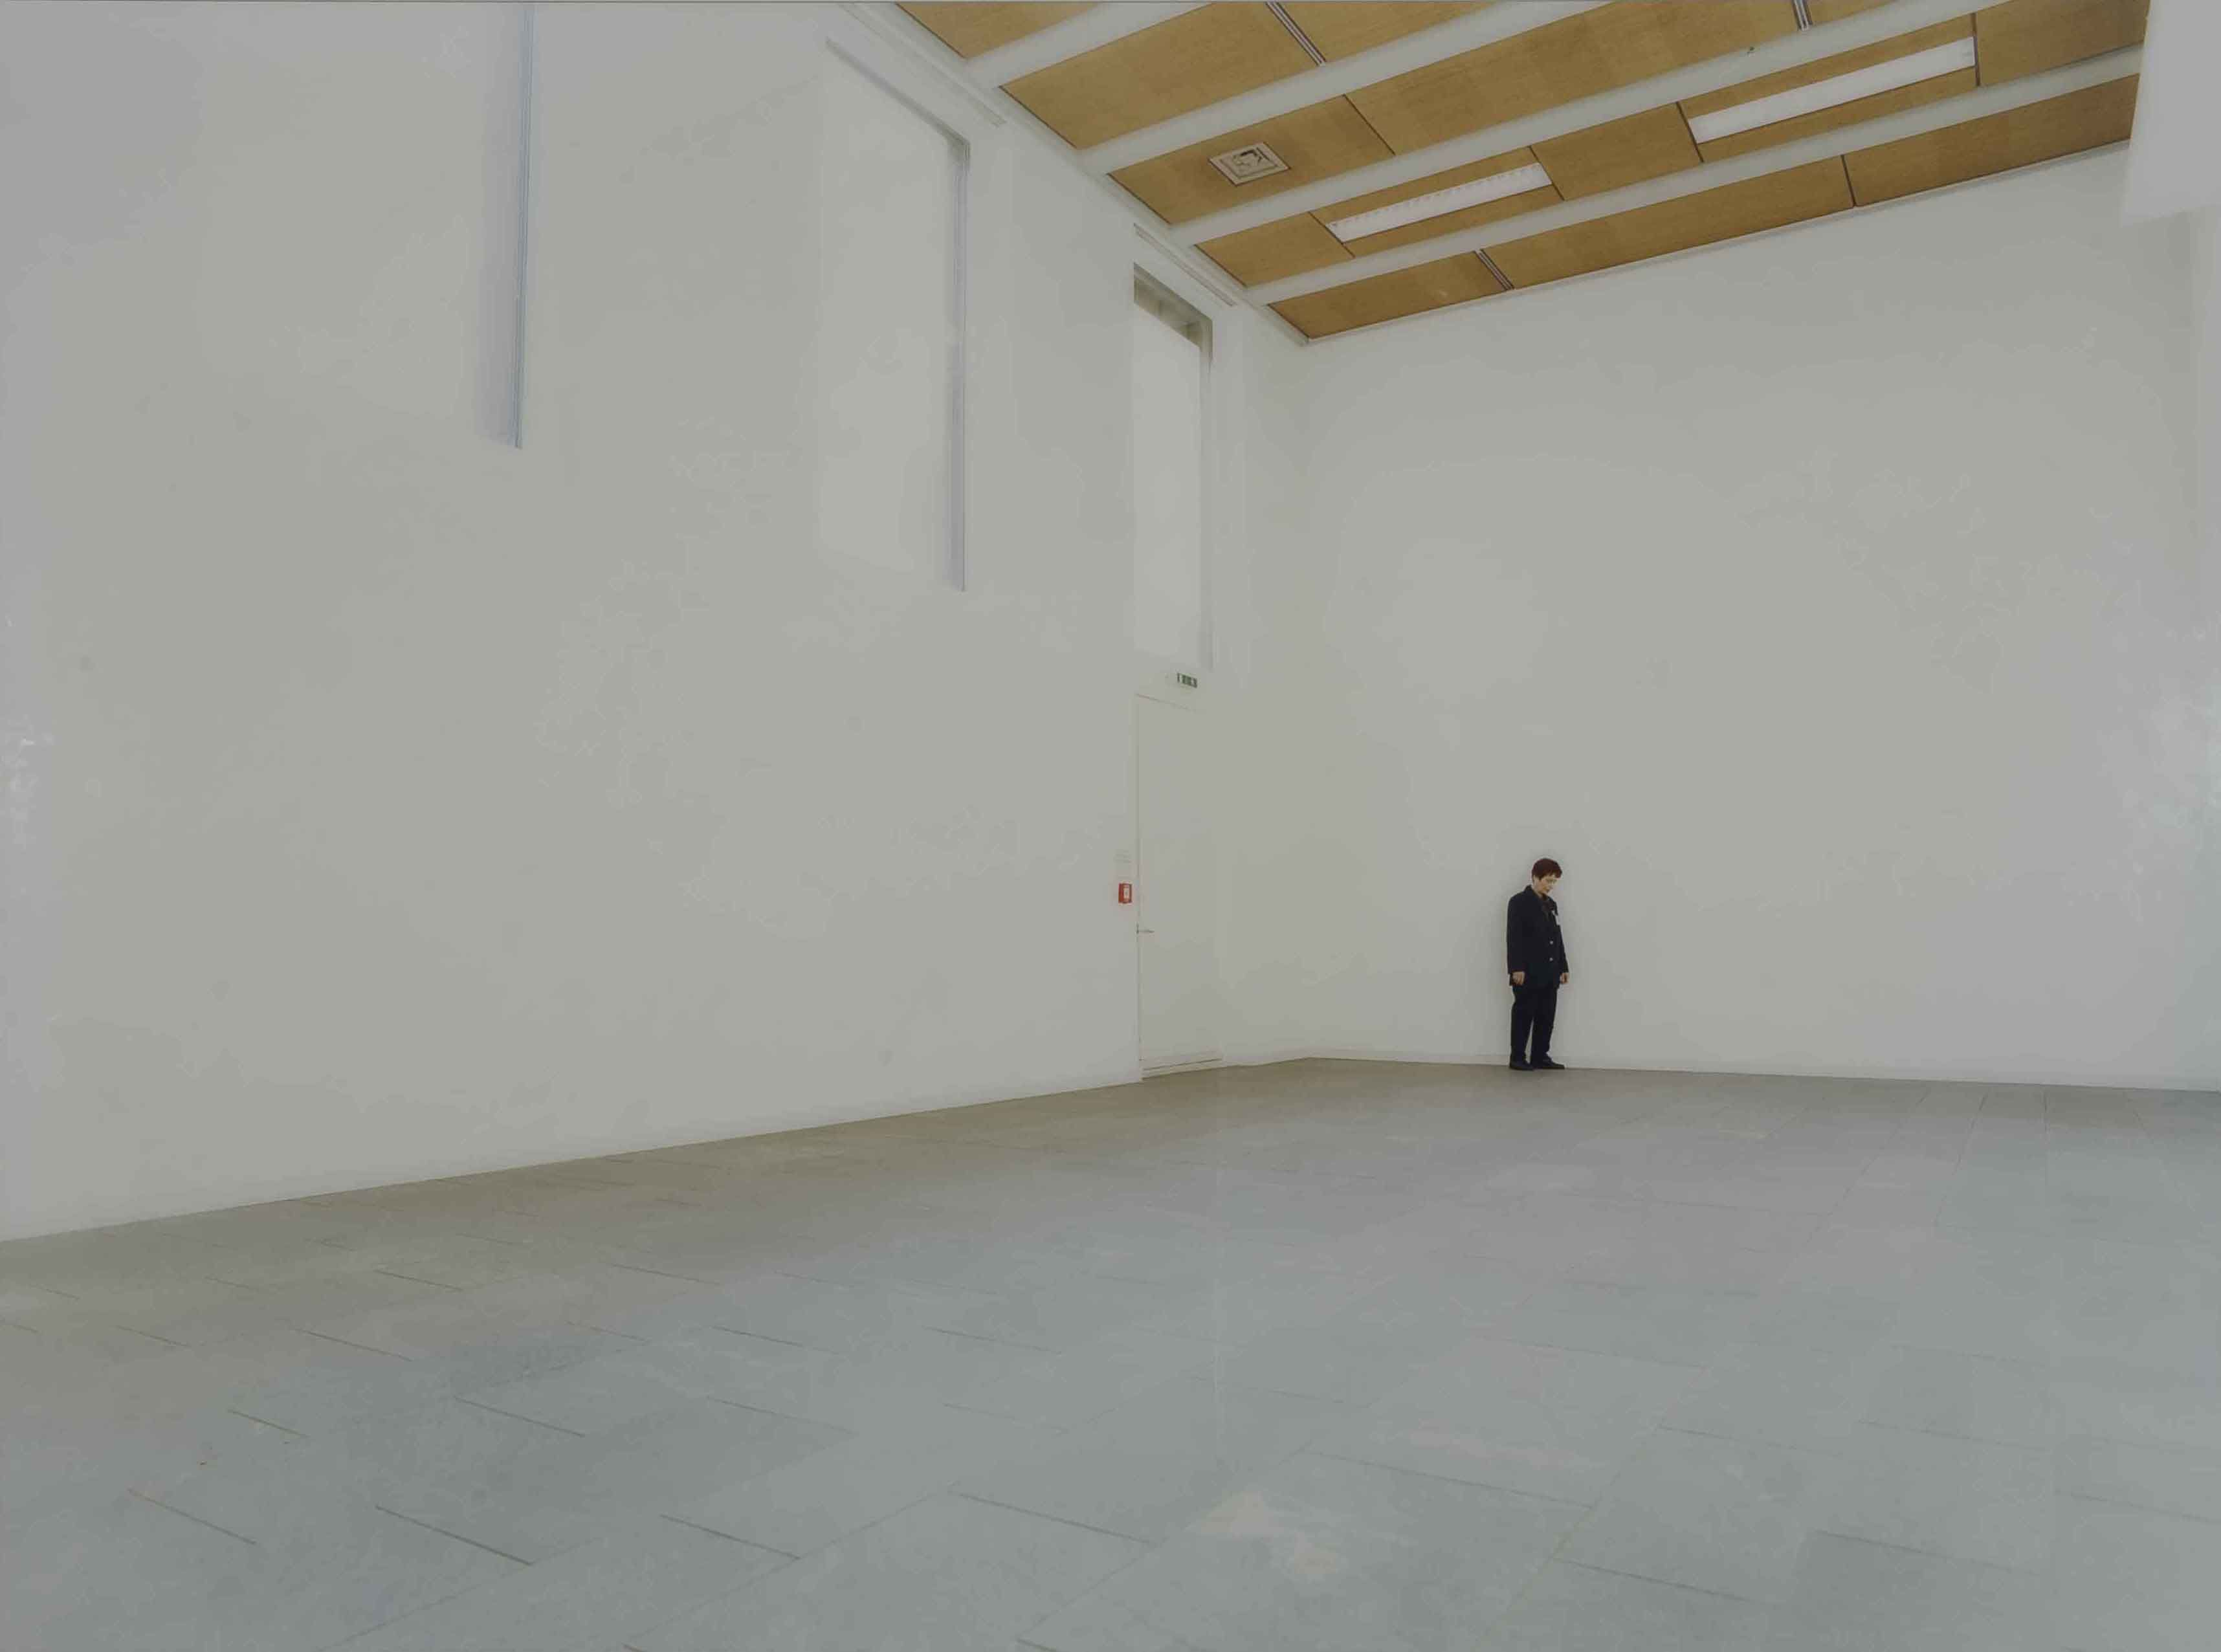 Between - Die Kunsthalle Mannheim I, 2003, C-Print auf Alu-Dibond, Plexiglas; 6-teilige Serie; Leihgabe des Förderkreises für die Kunsthalle Mannheim e.V. seit 2003; © VG Bild-Kunst, Bonn 2013